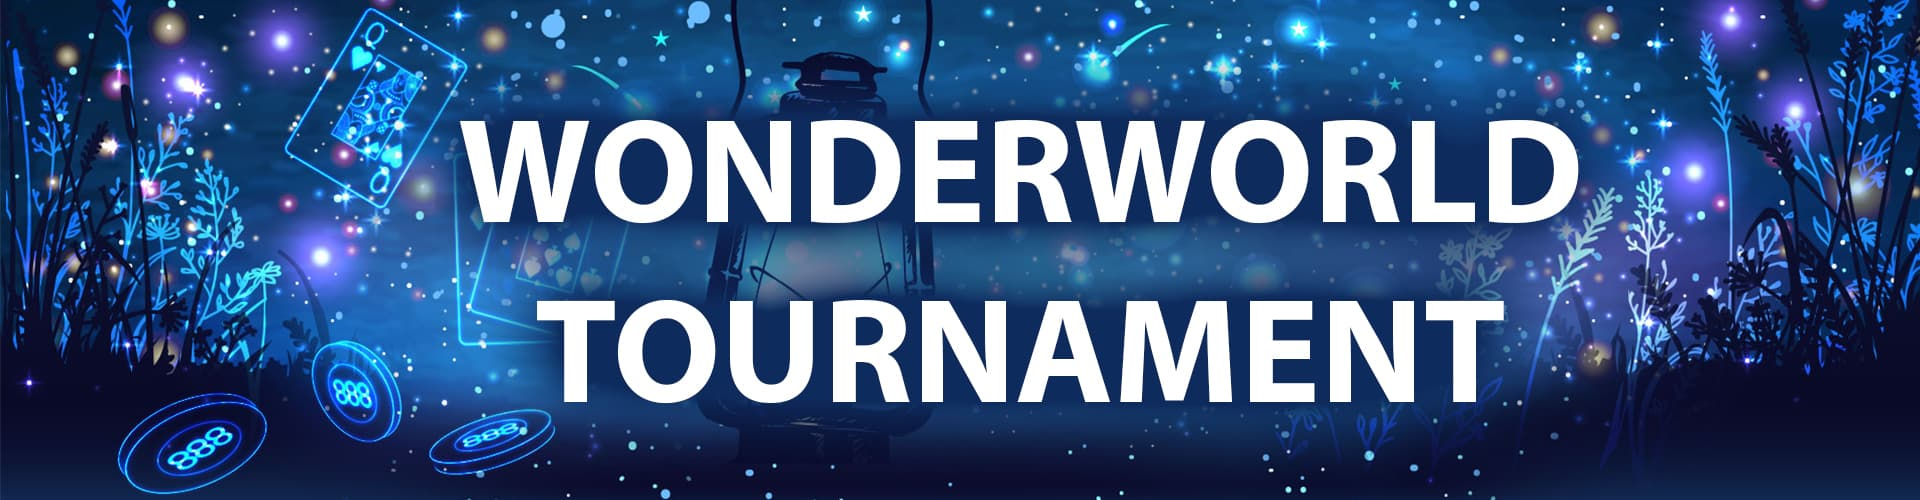 Wonderworld Tournament